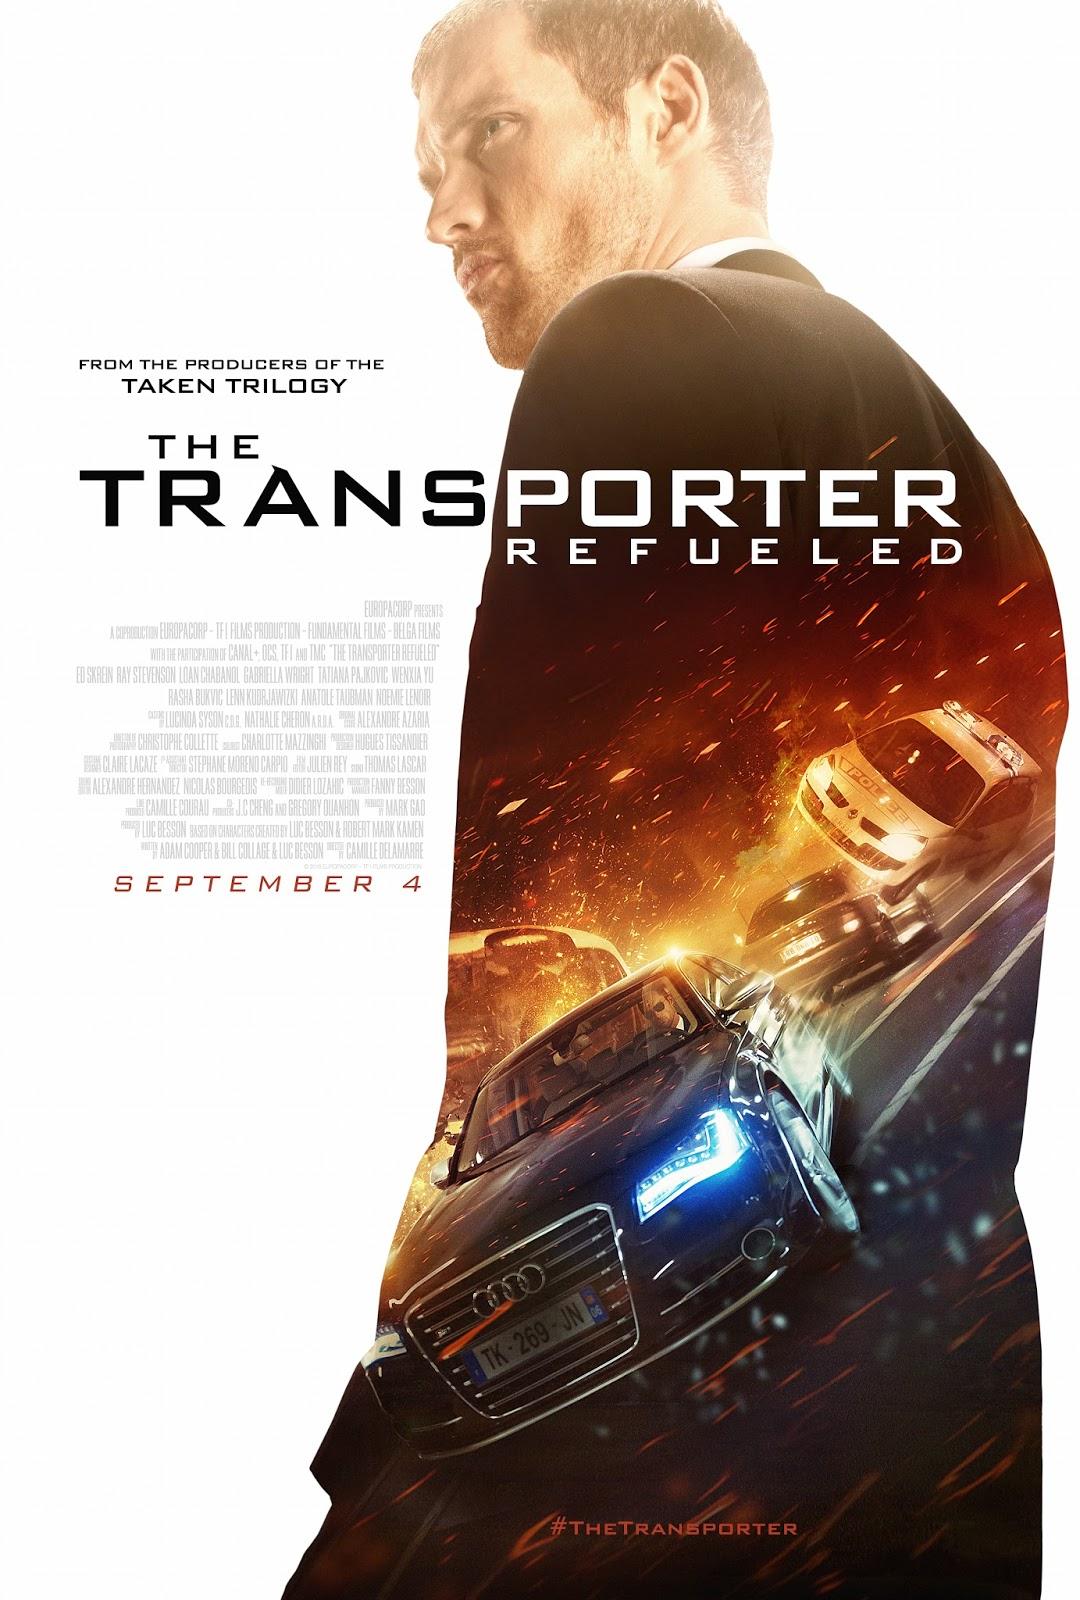 The Transporter Refueled 2015 - Full (HDRIP)